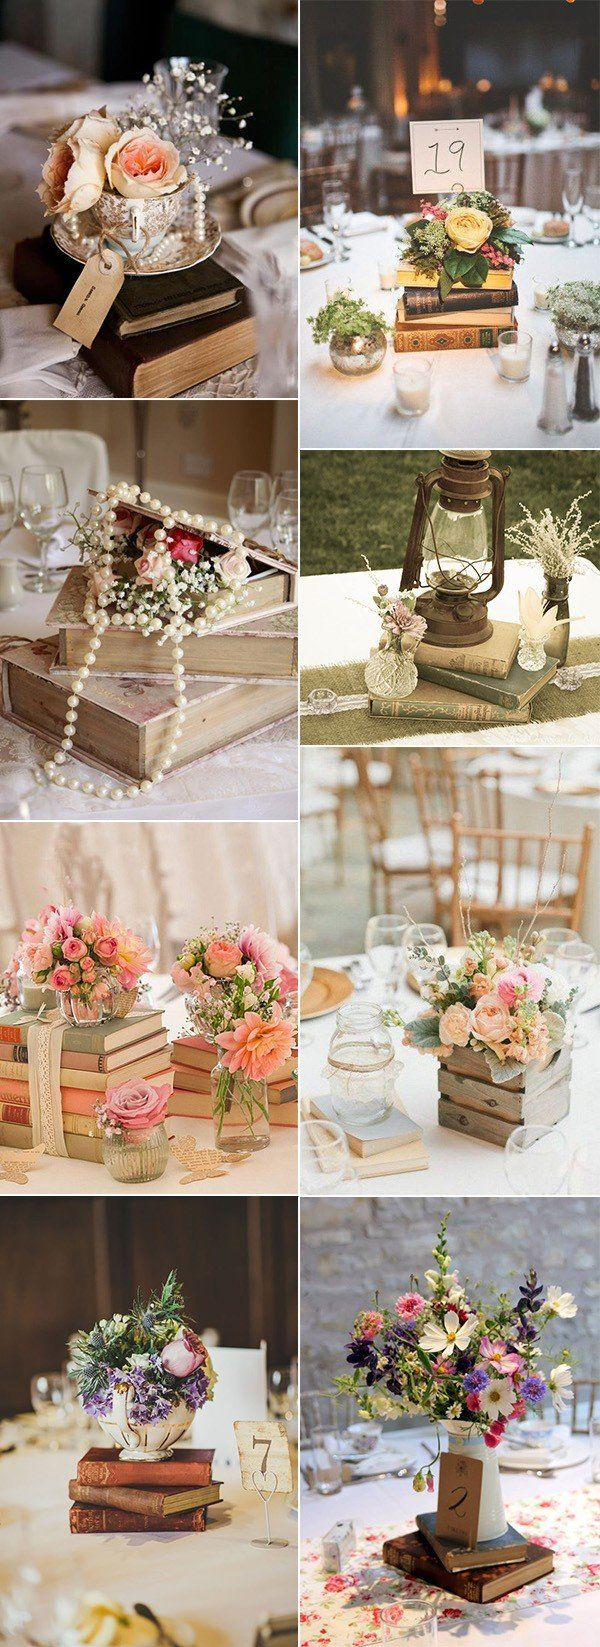 Vintage style wedding decoration ideas   Fabulous Vintage Wedding Centerpiece Decoration Ideas  Wedding